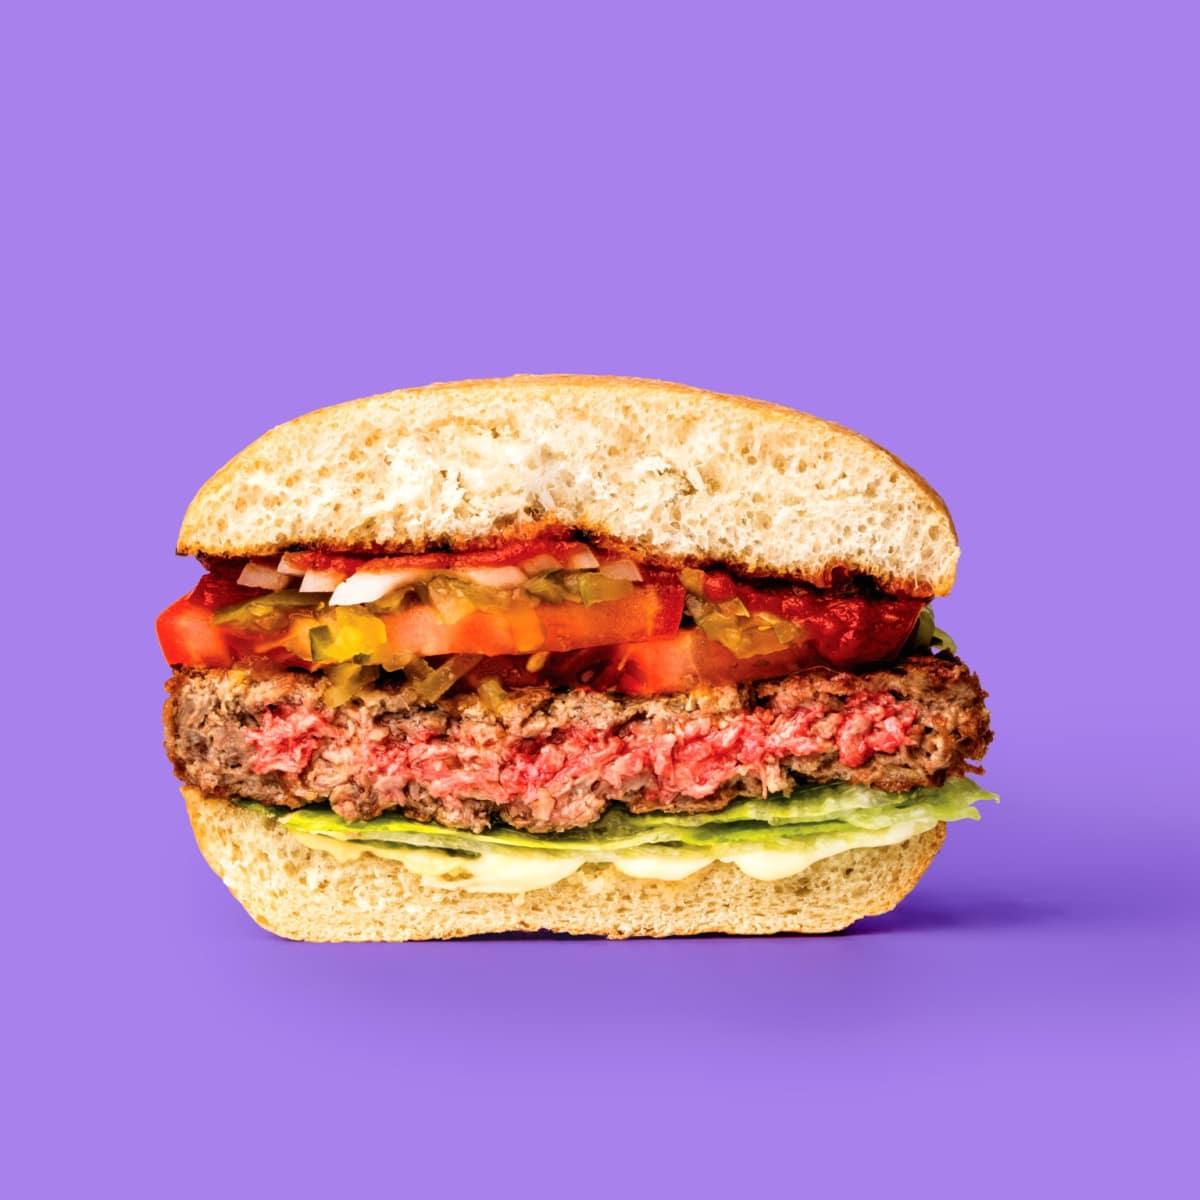 Impossible Burger half